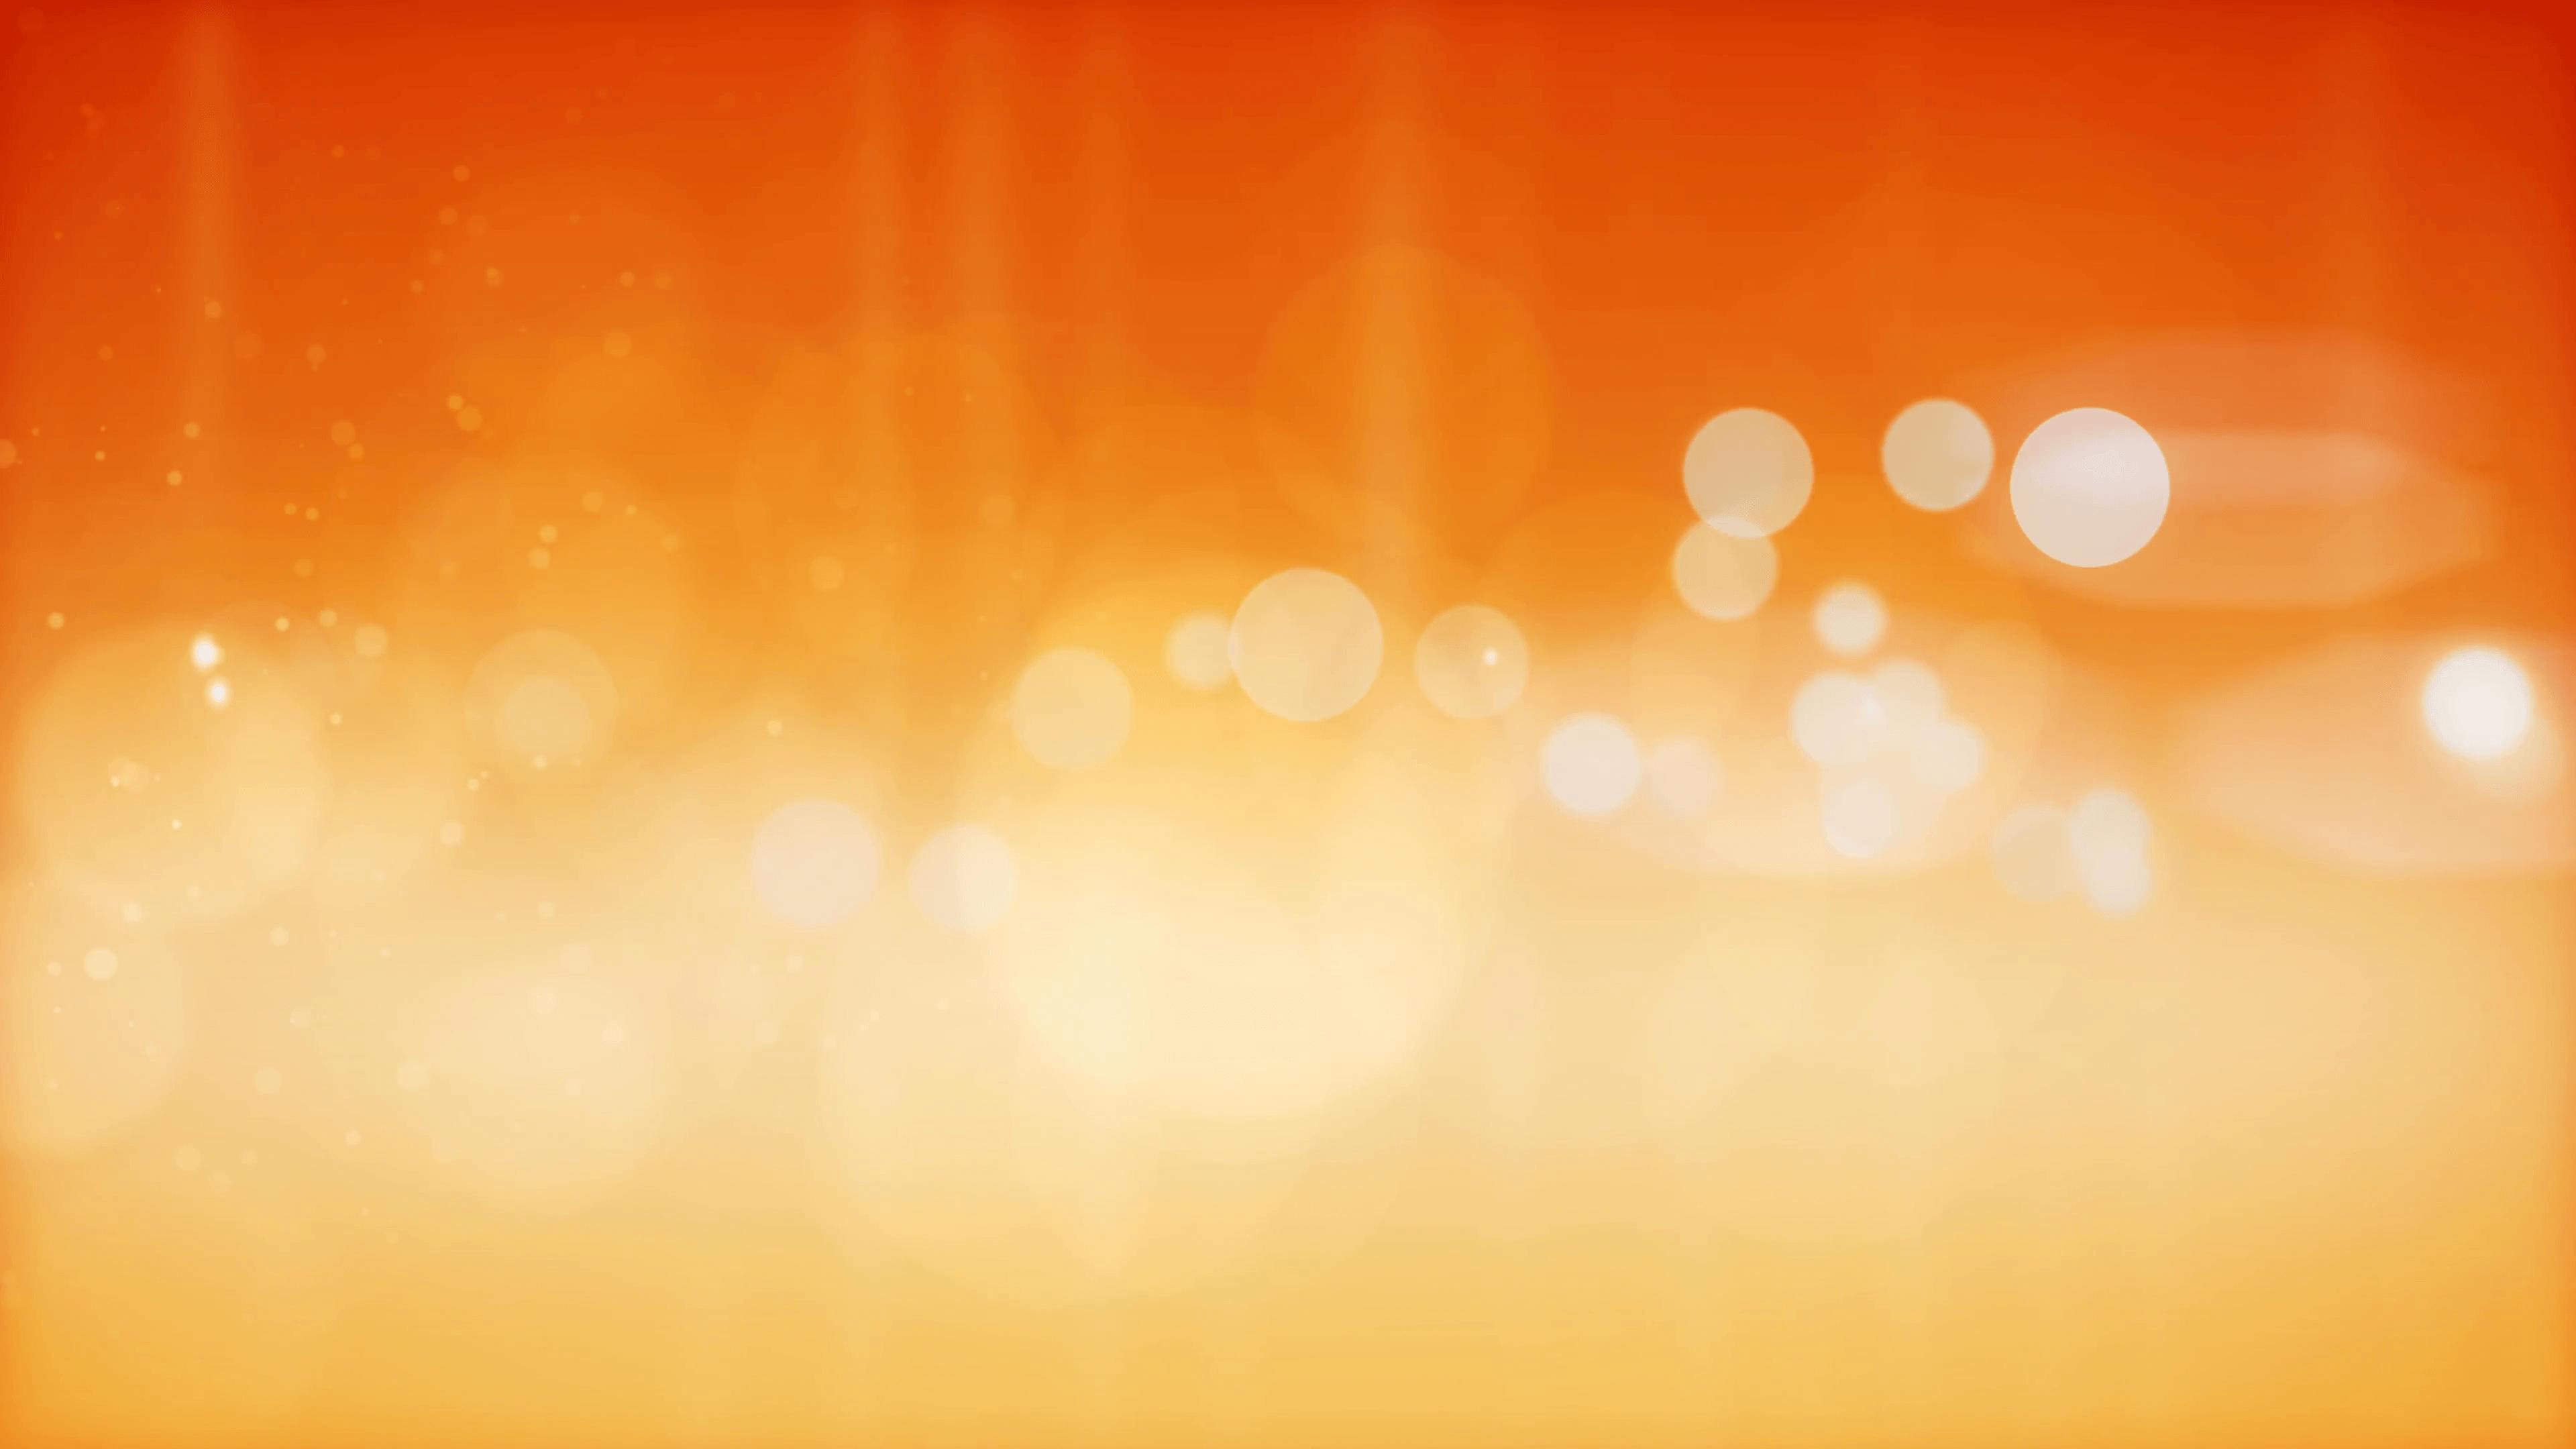 Orange Backgrounds Yeterwpartco